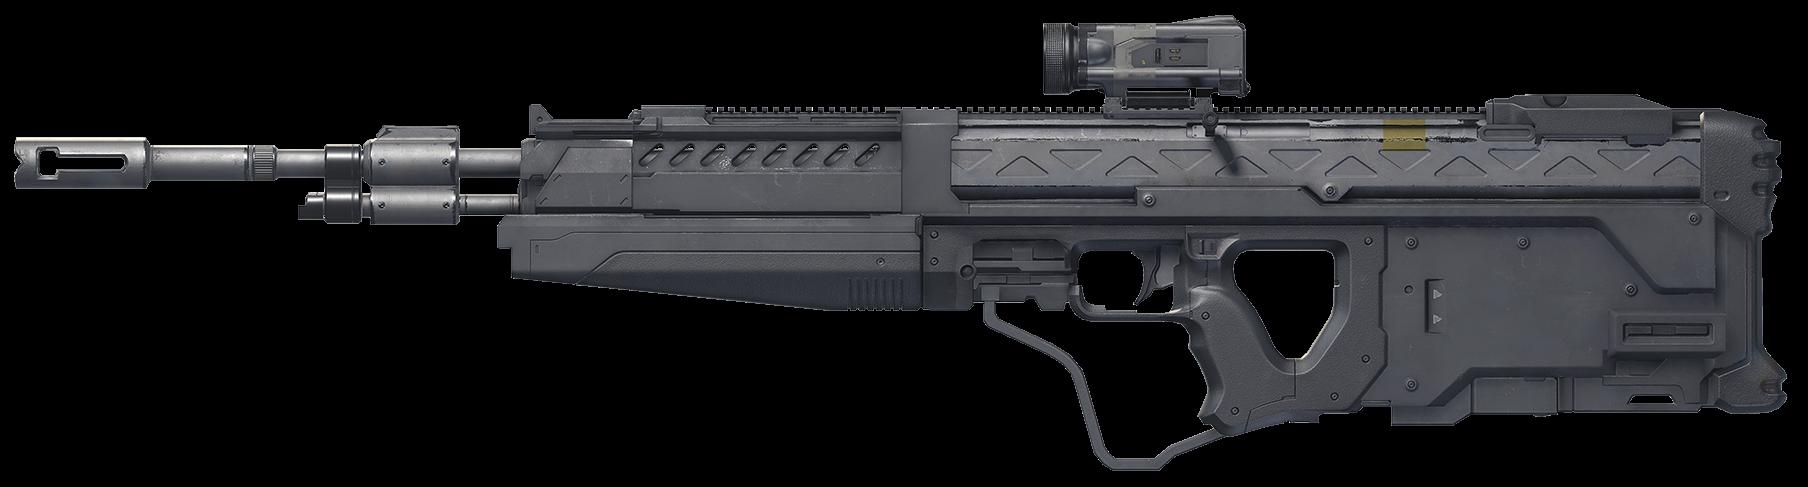 M395B Designated Marksman Rifle